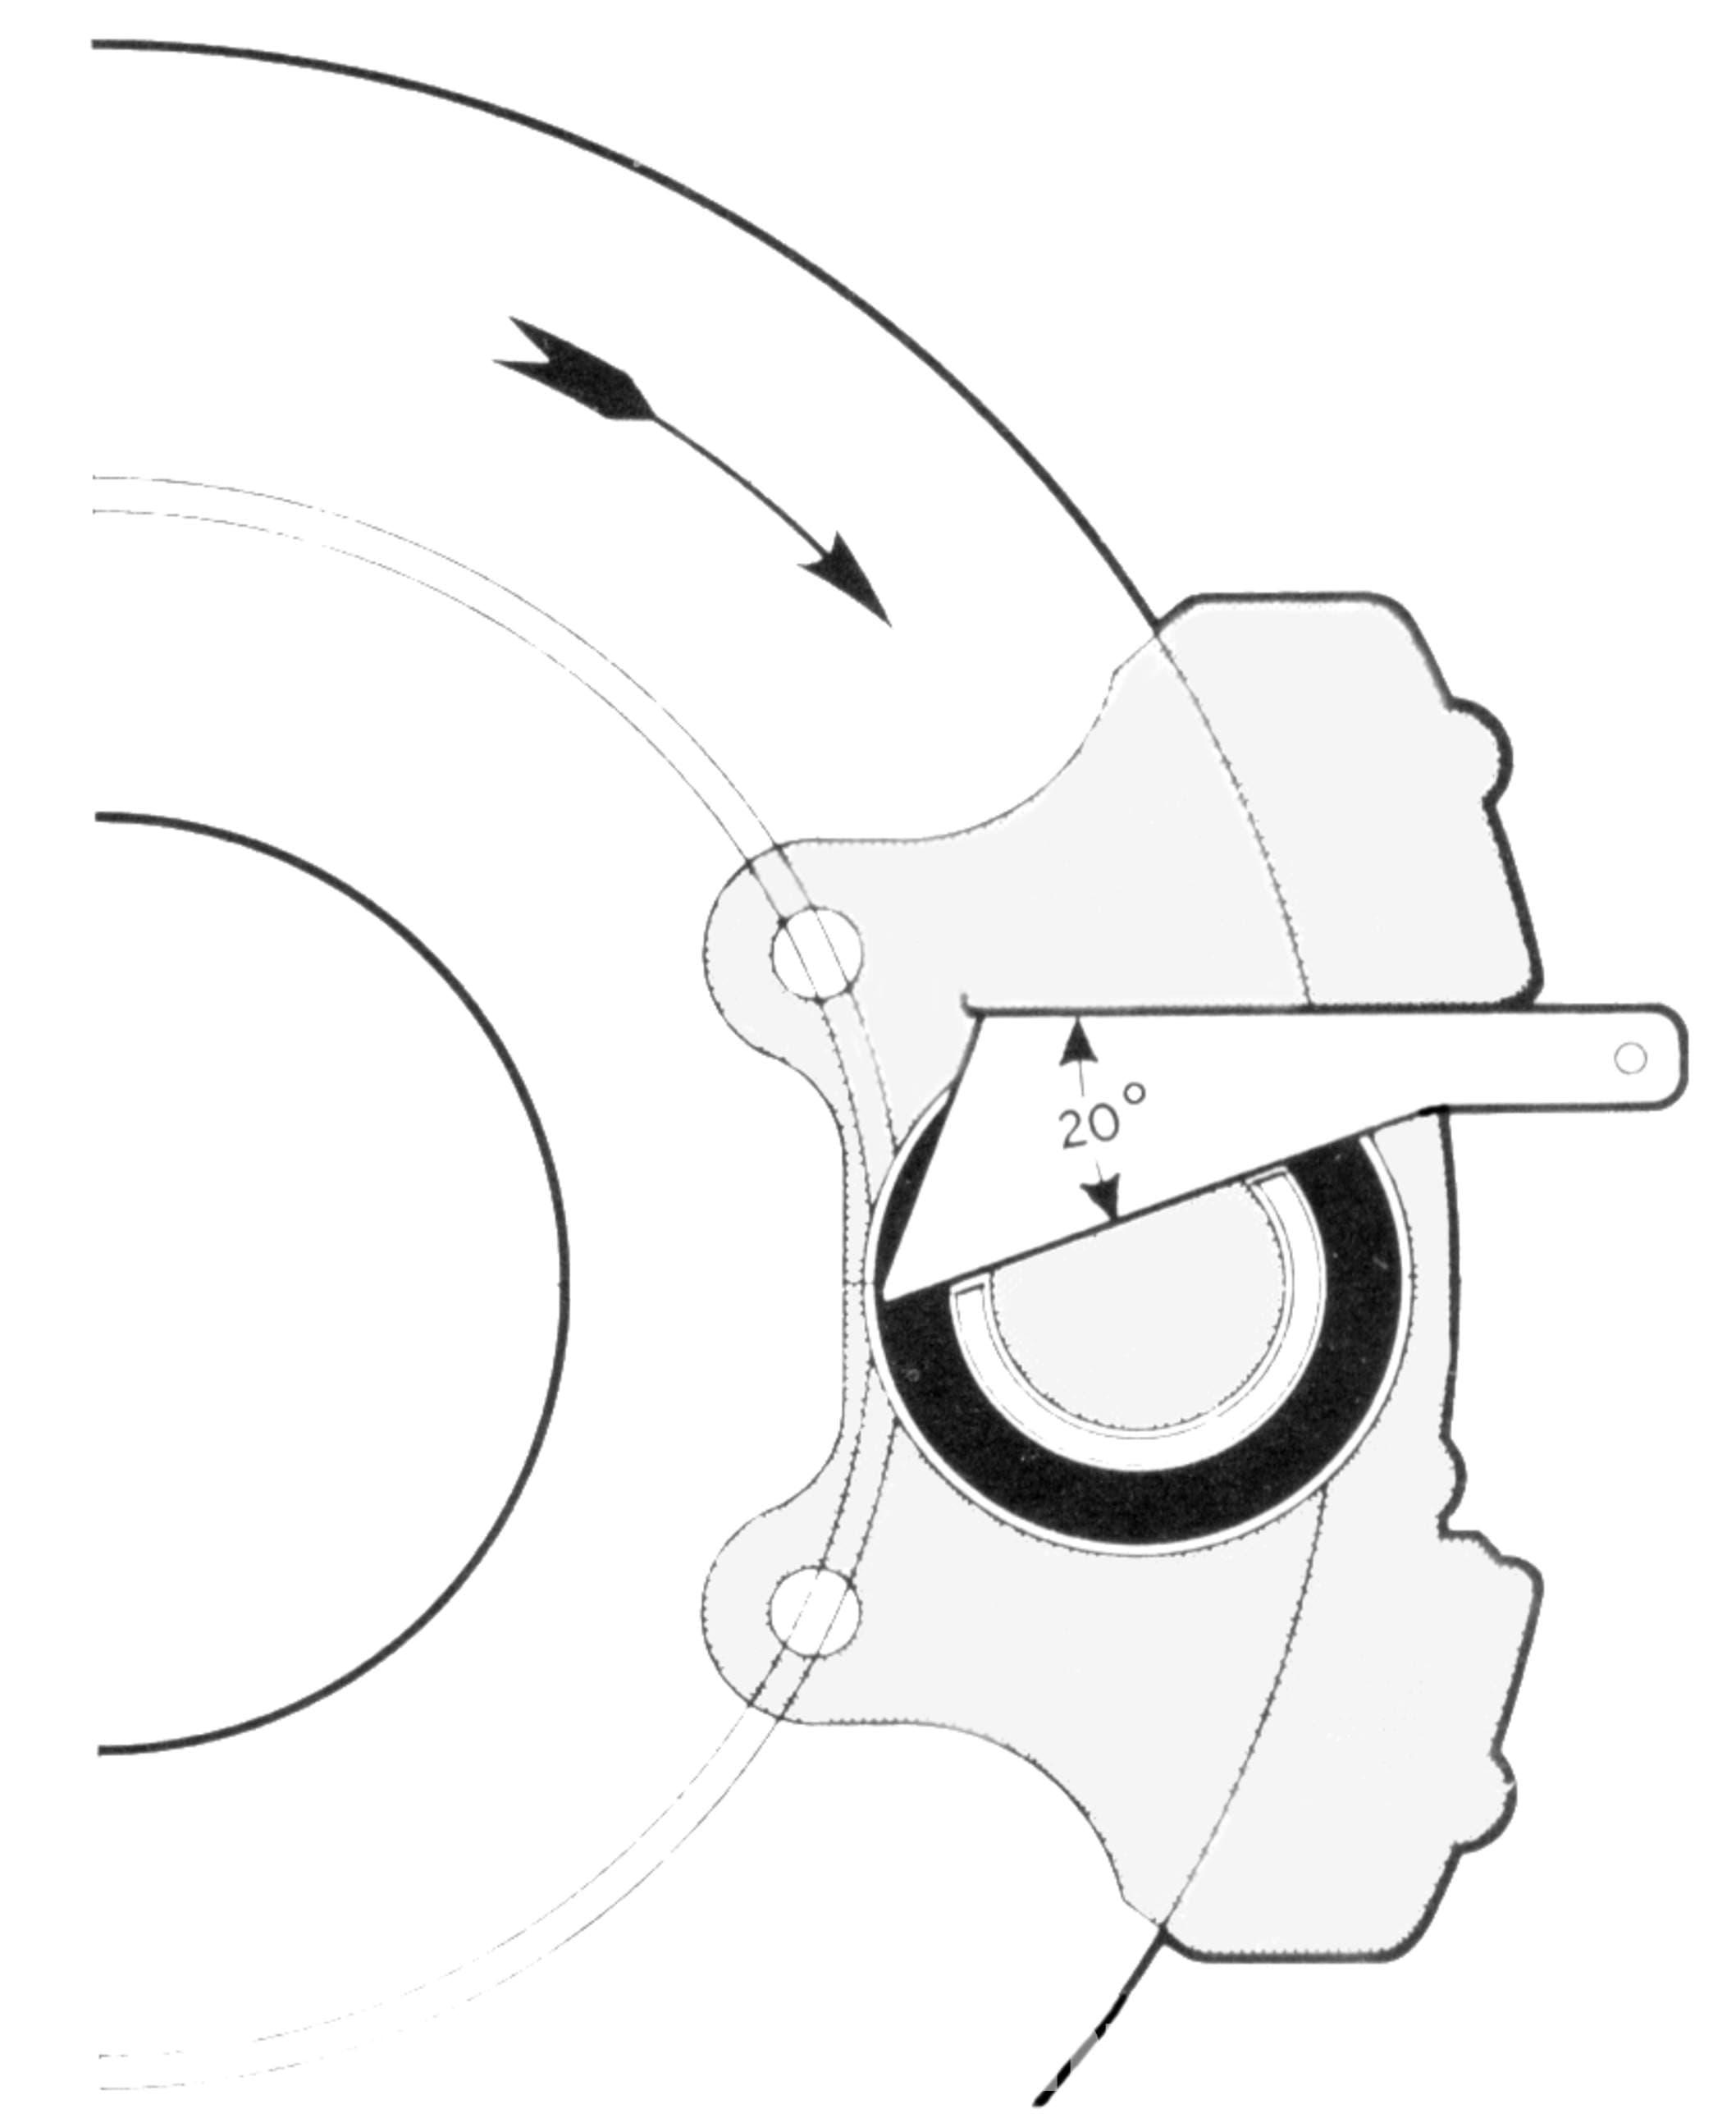 diagram of outside calliper best wiring library Peterbilt Hooklift large image extra large image